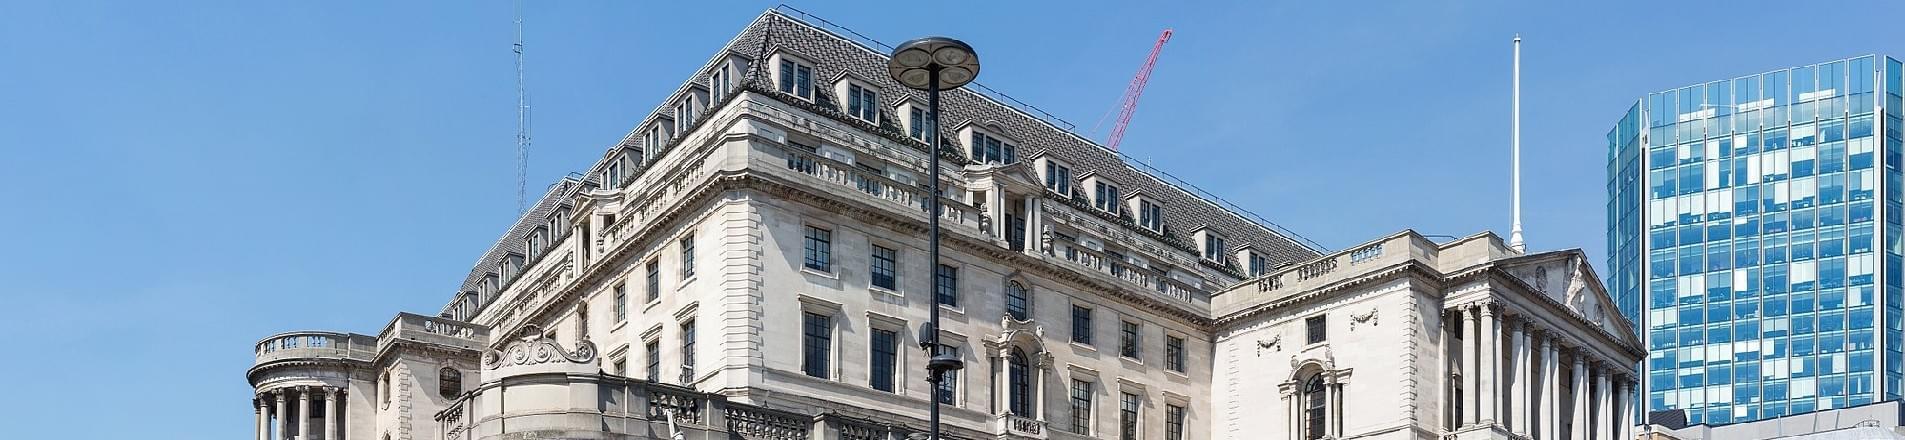 Lloyds to help senior men and women return to work